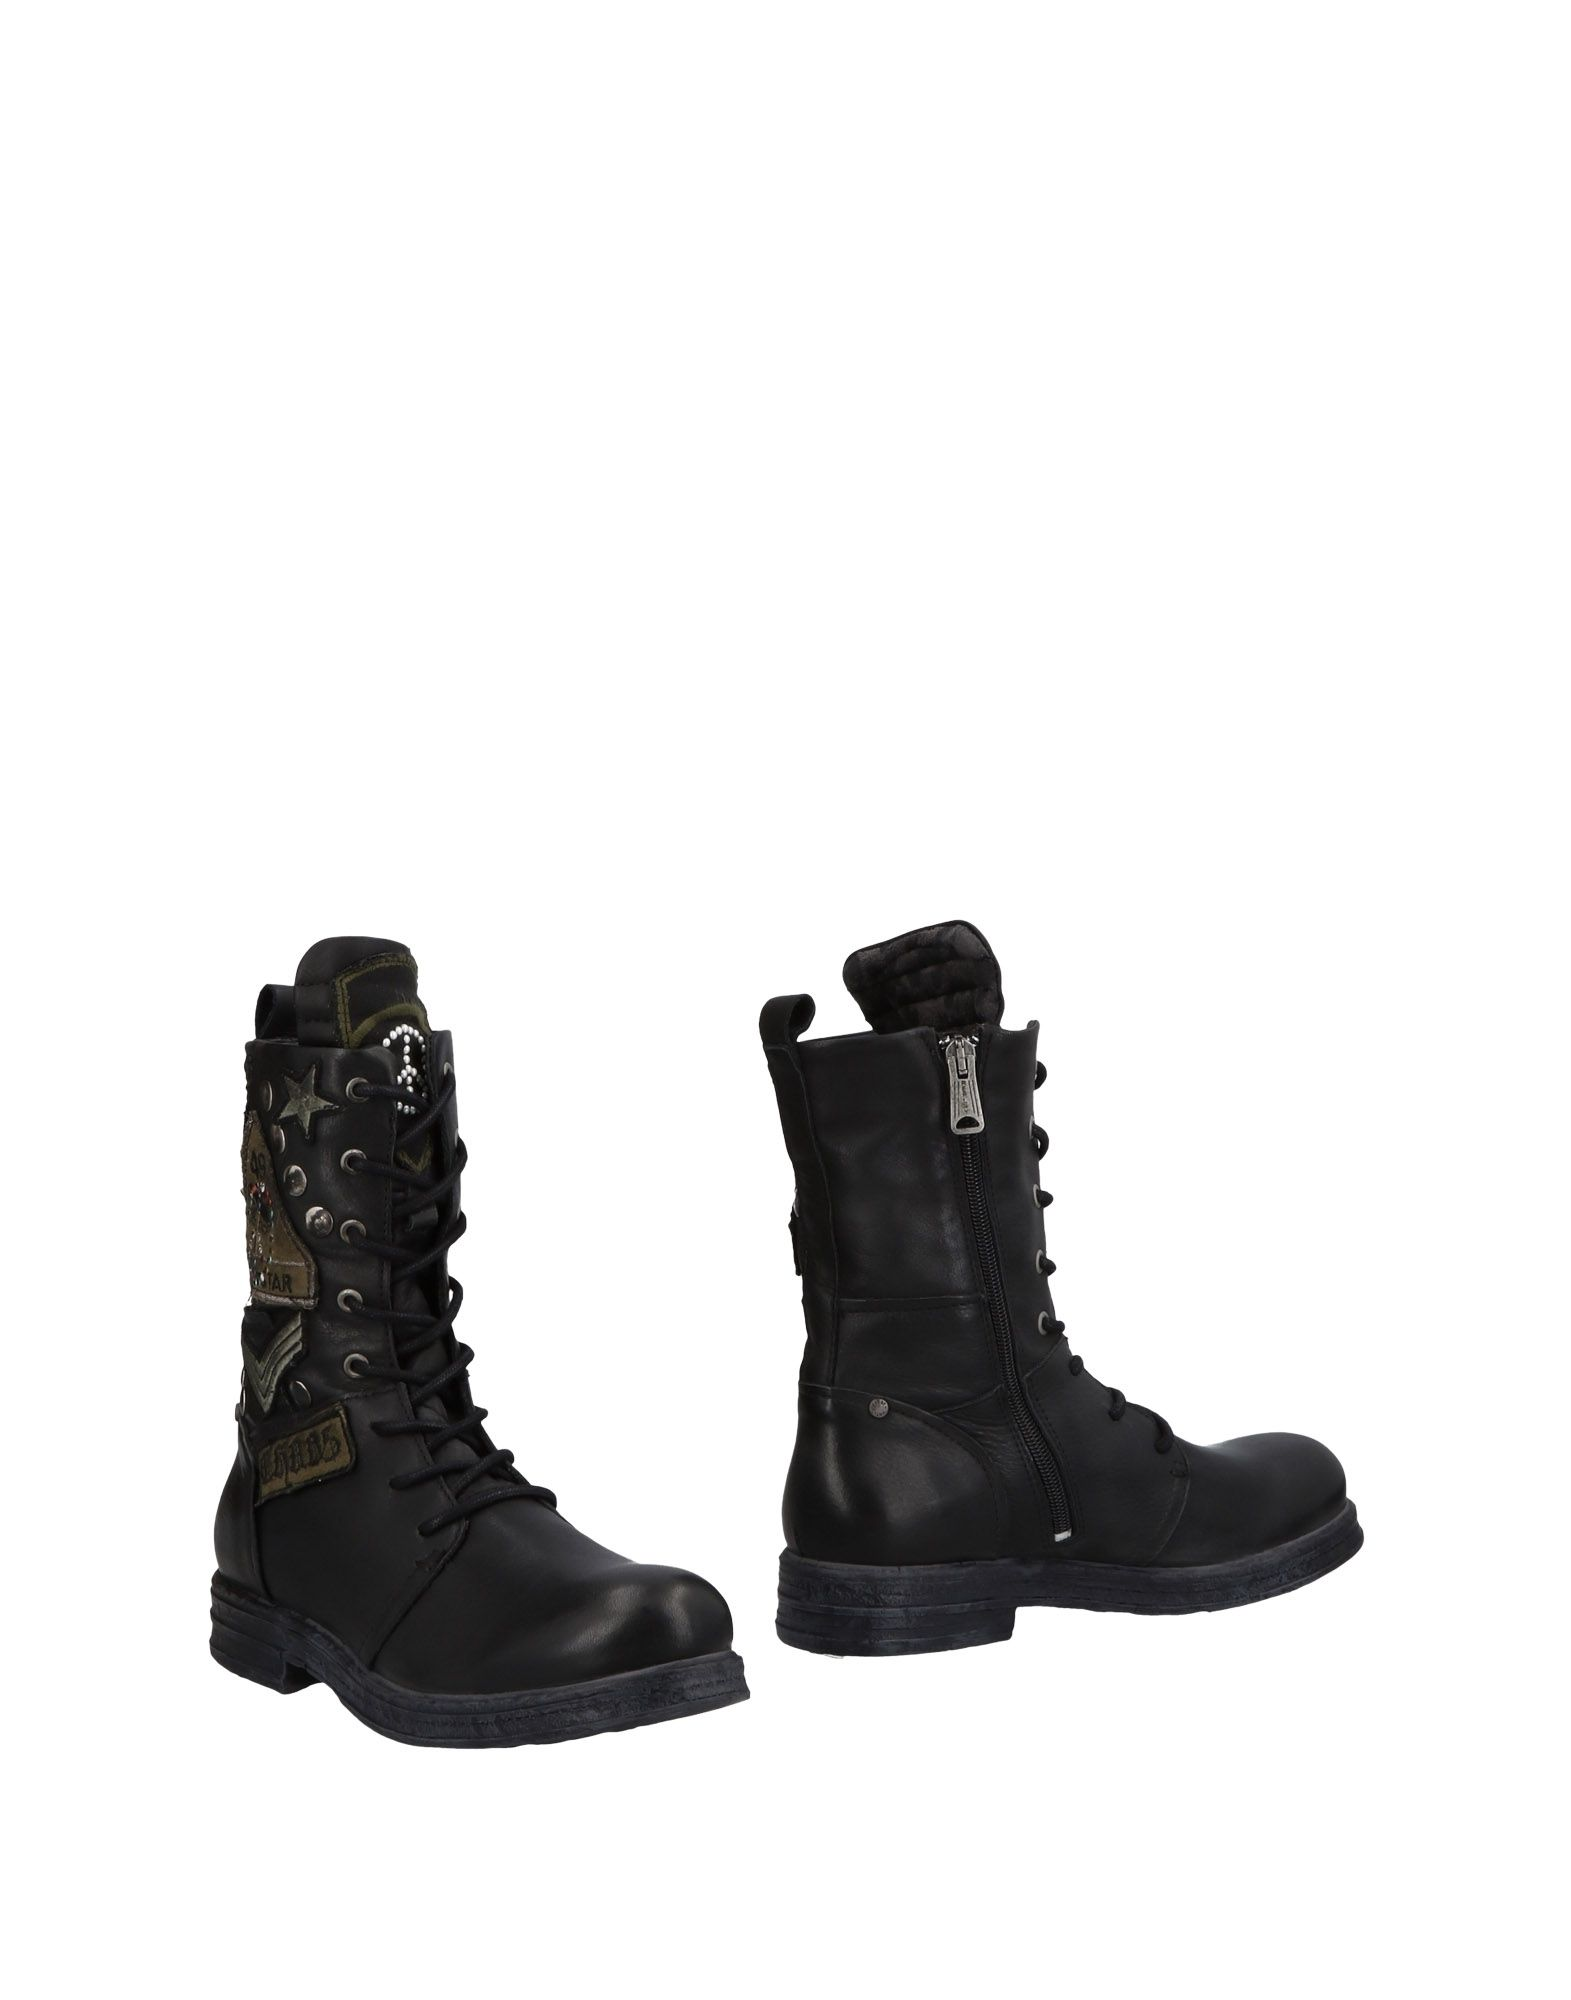 Replay Stiefelette Damen  11493779JXGut aussehende strapazierfähige strapazierfähige strapazierfähige Schuhe f8181e